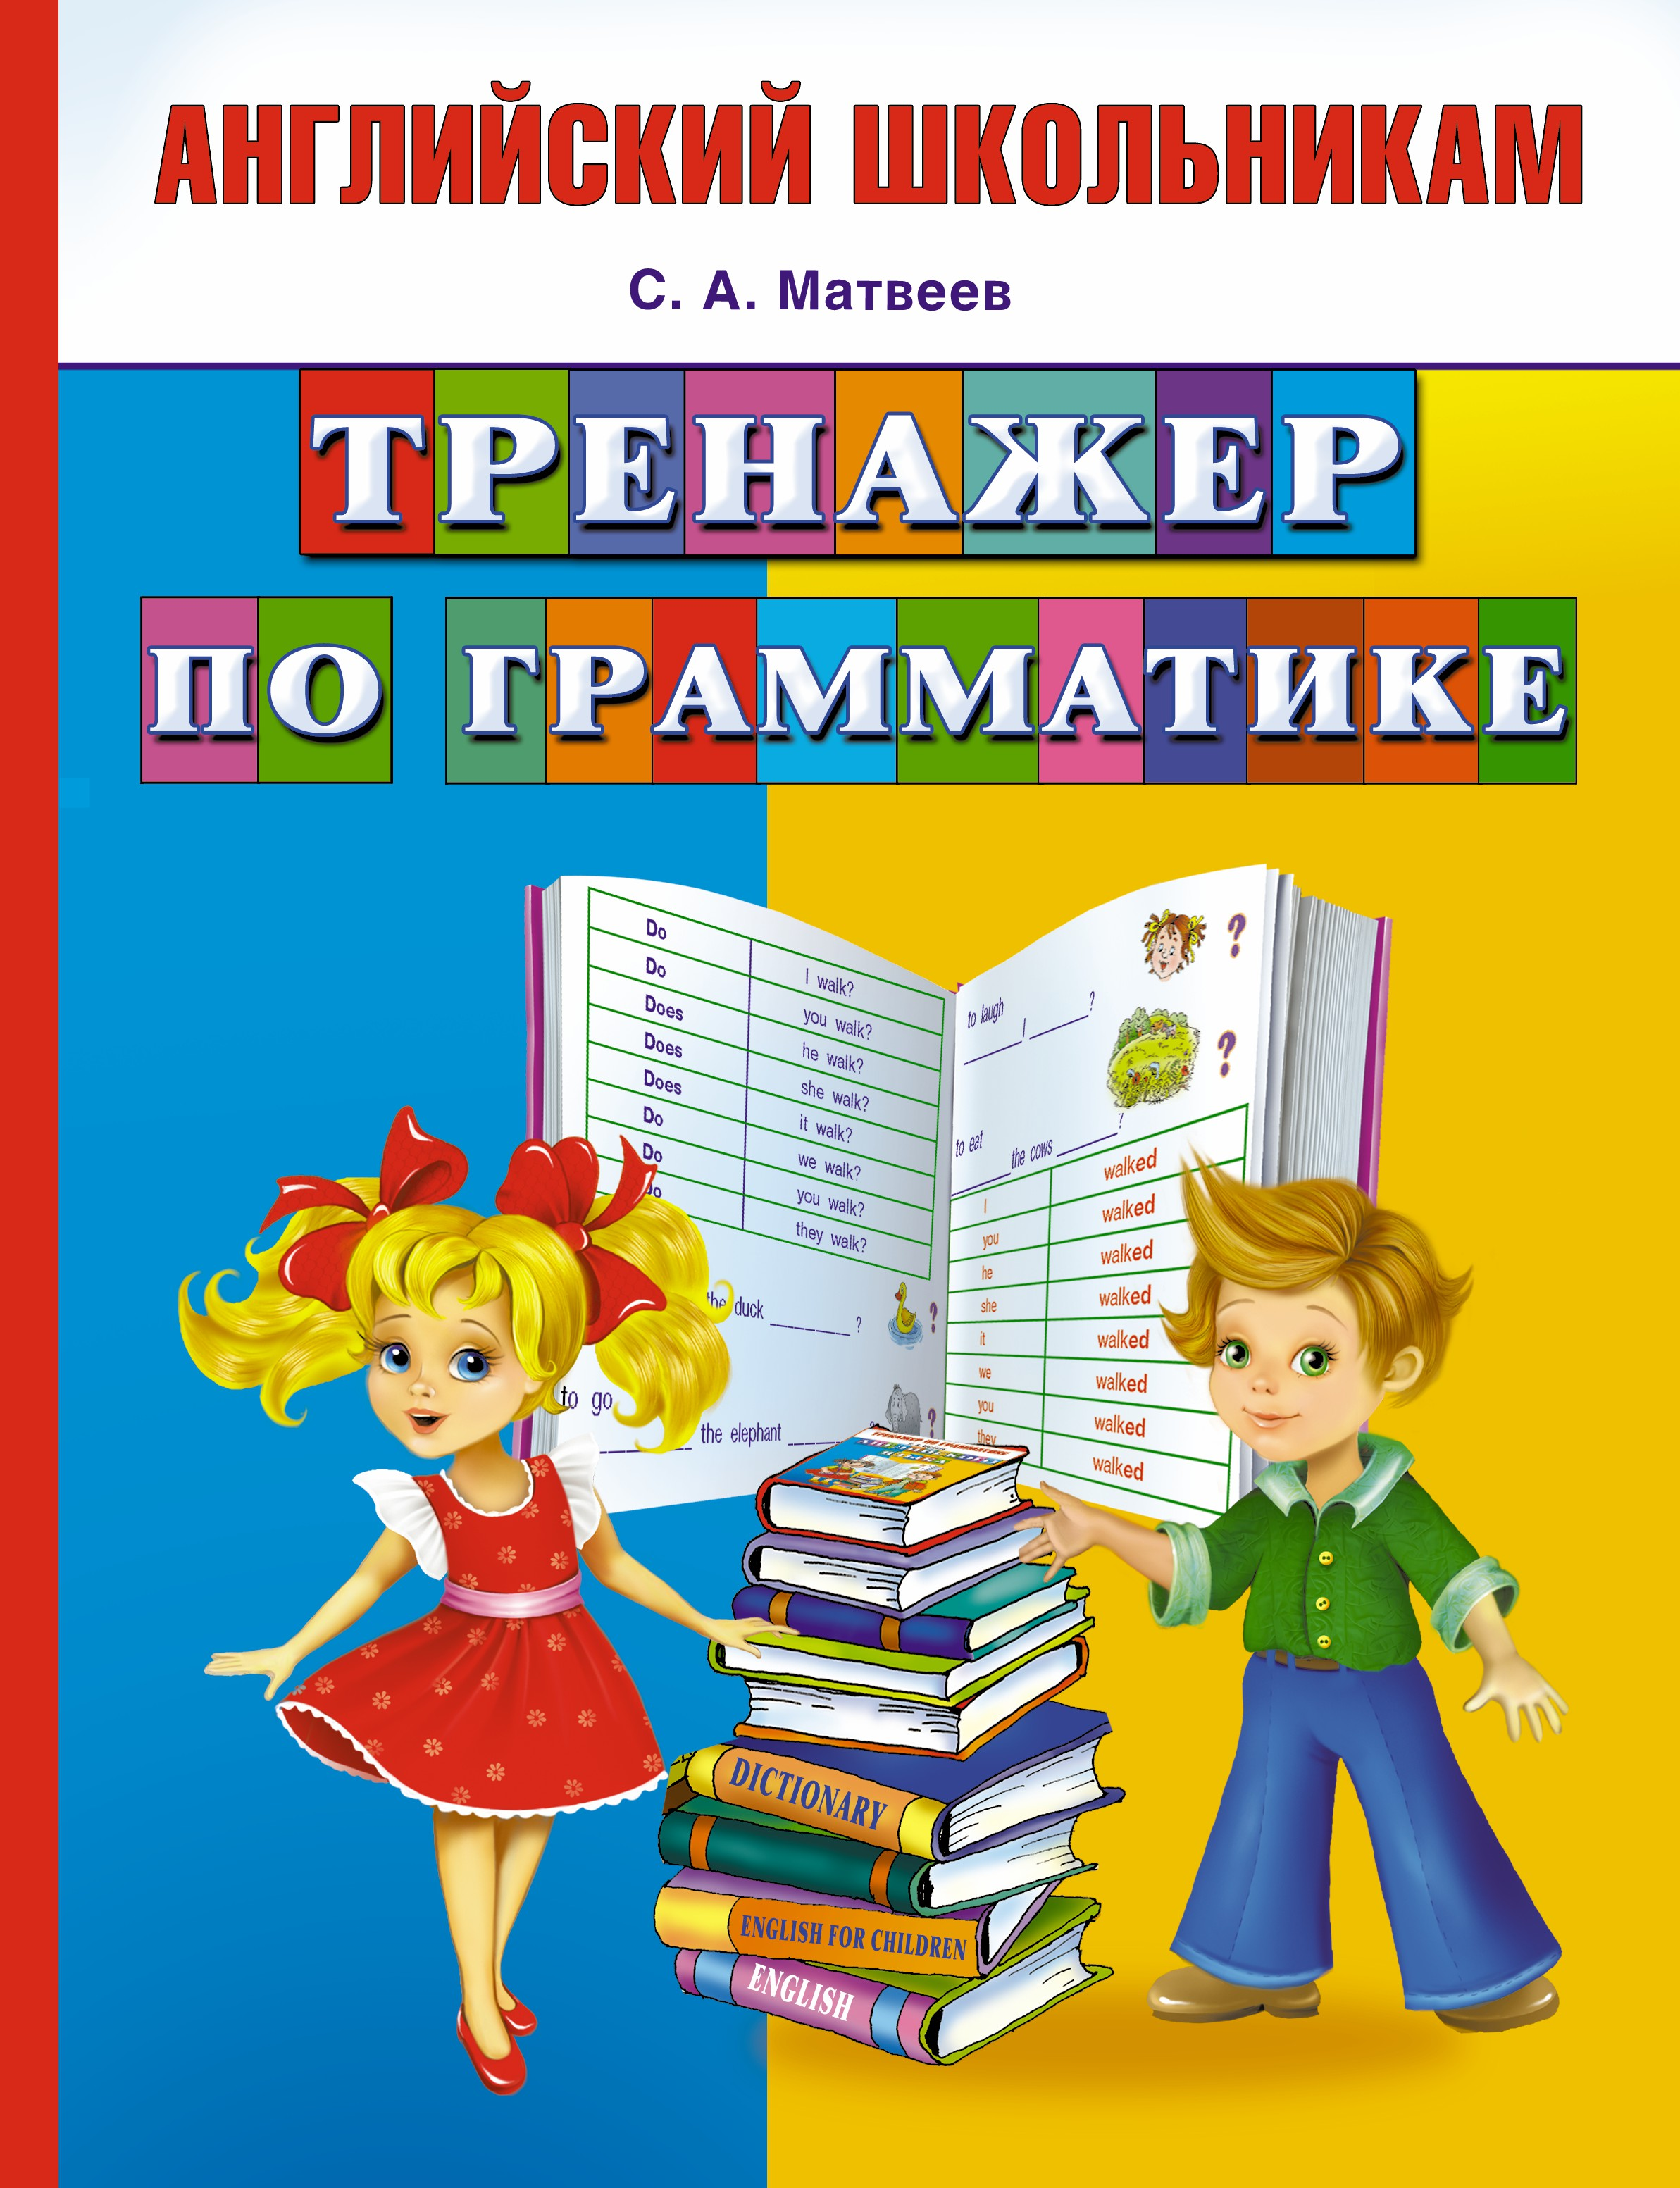 Матвеев С.А. Тренажер по грамматике английского языка